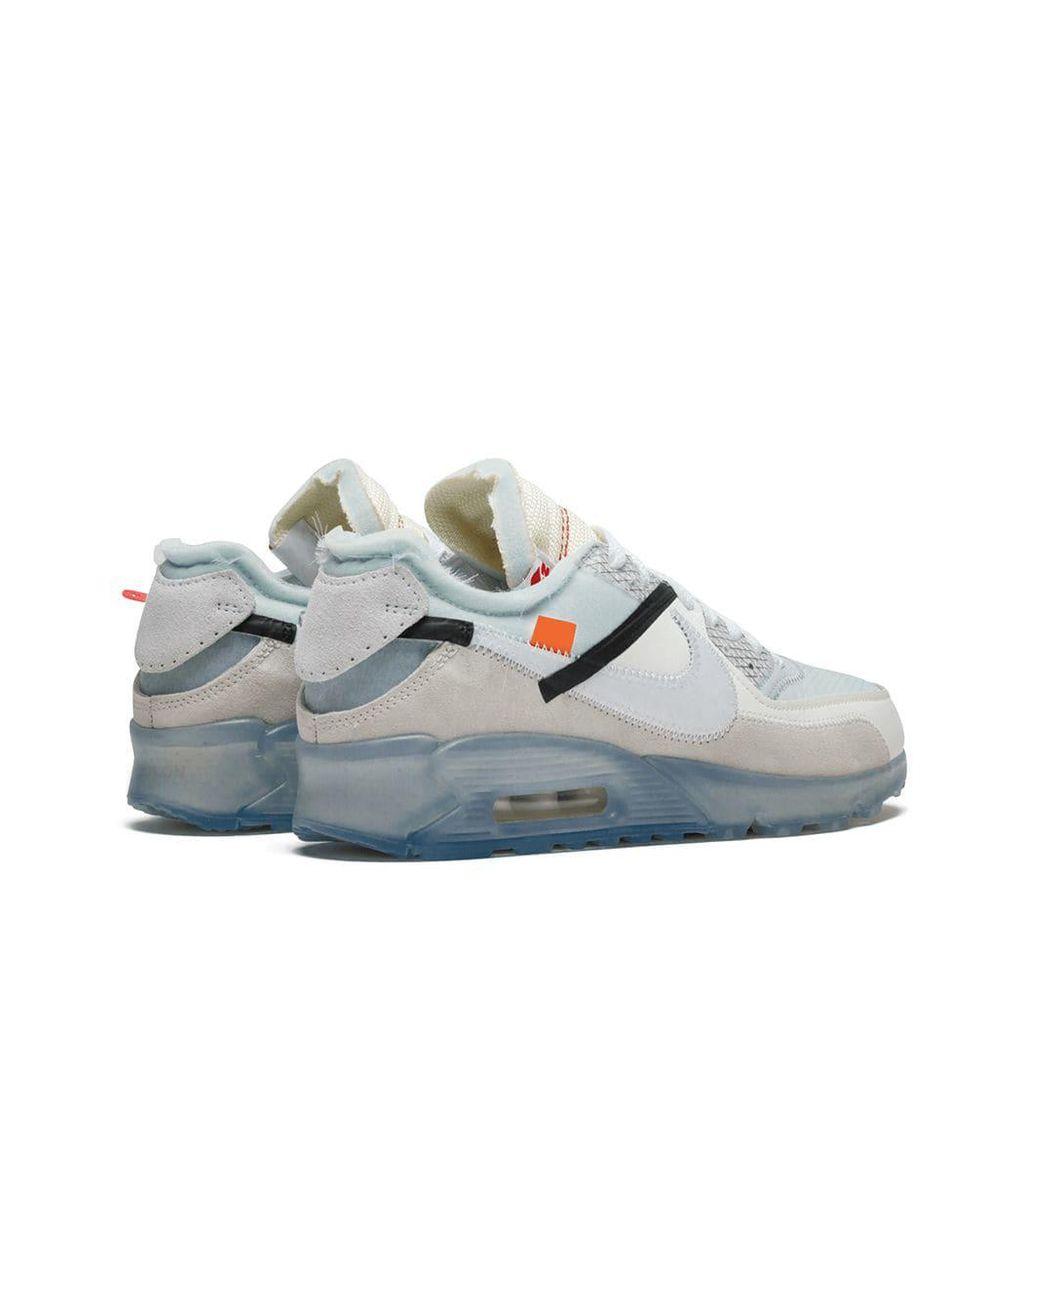 Nike Nike x Off White The 10: Air Max 90 Farfetch